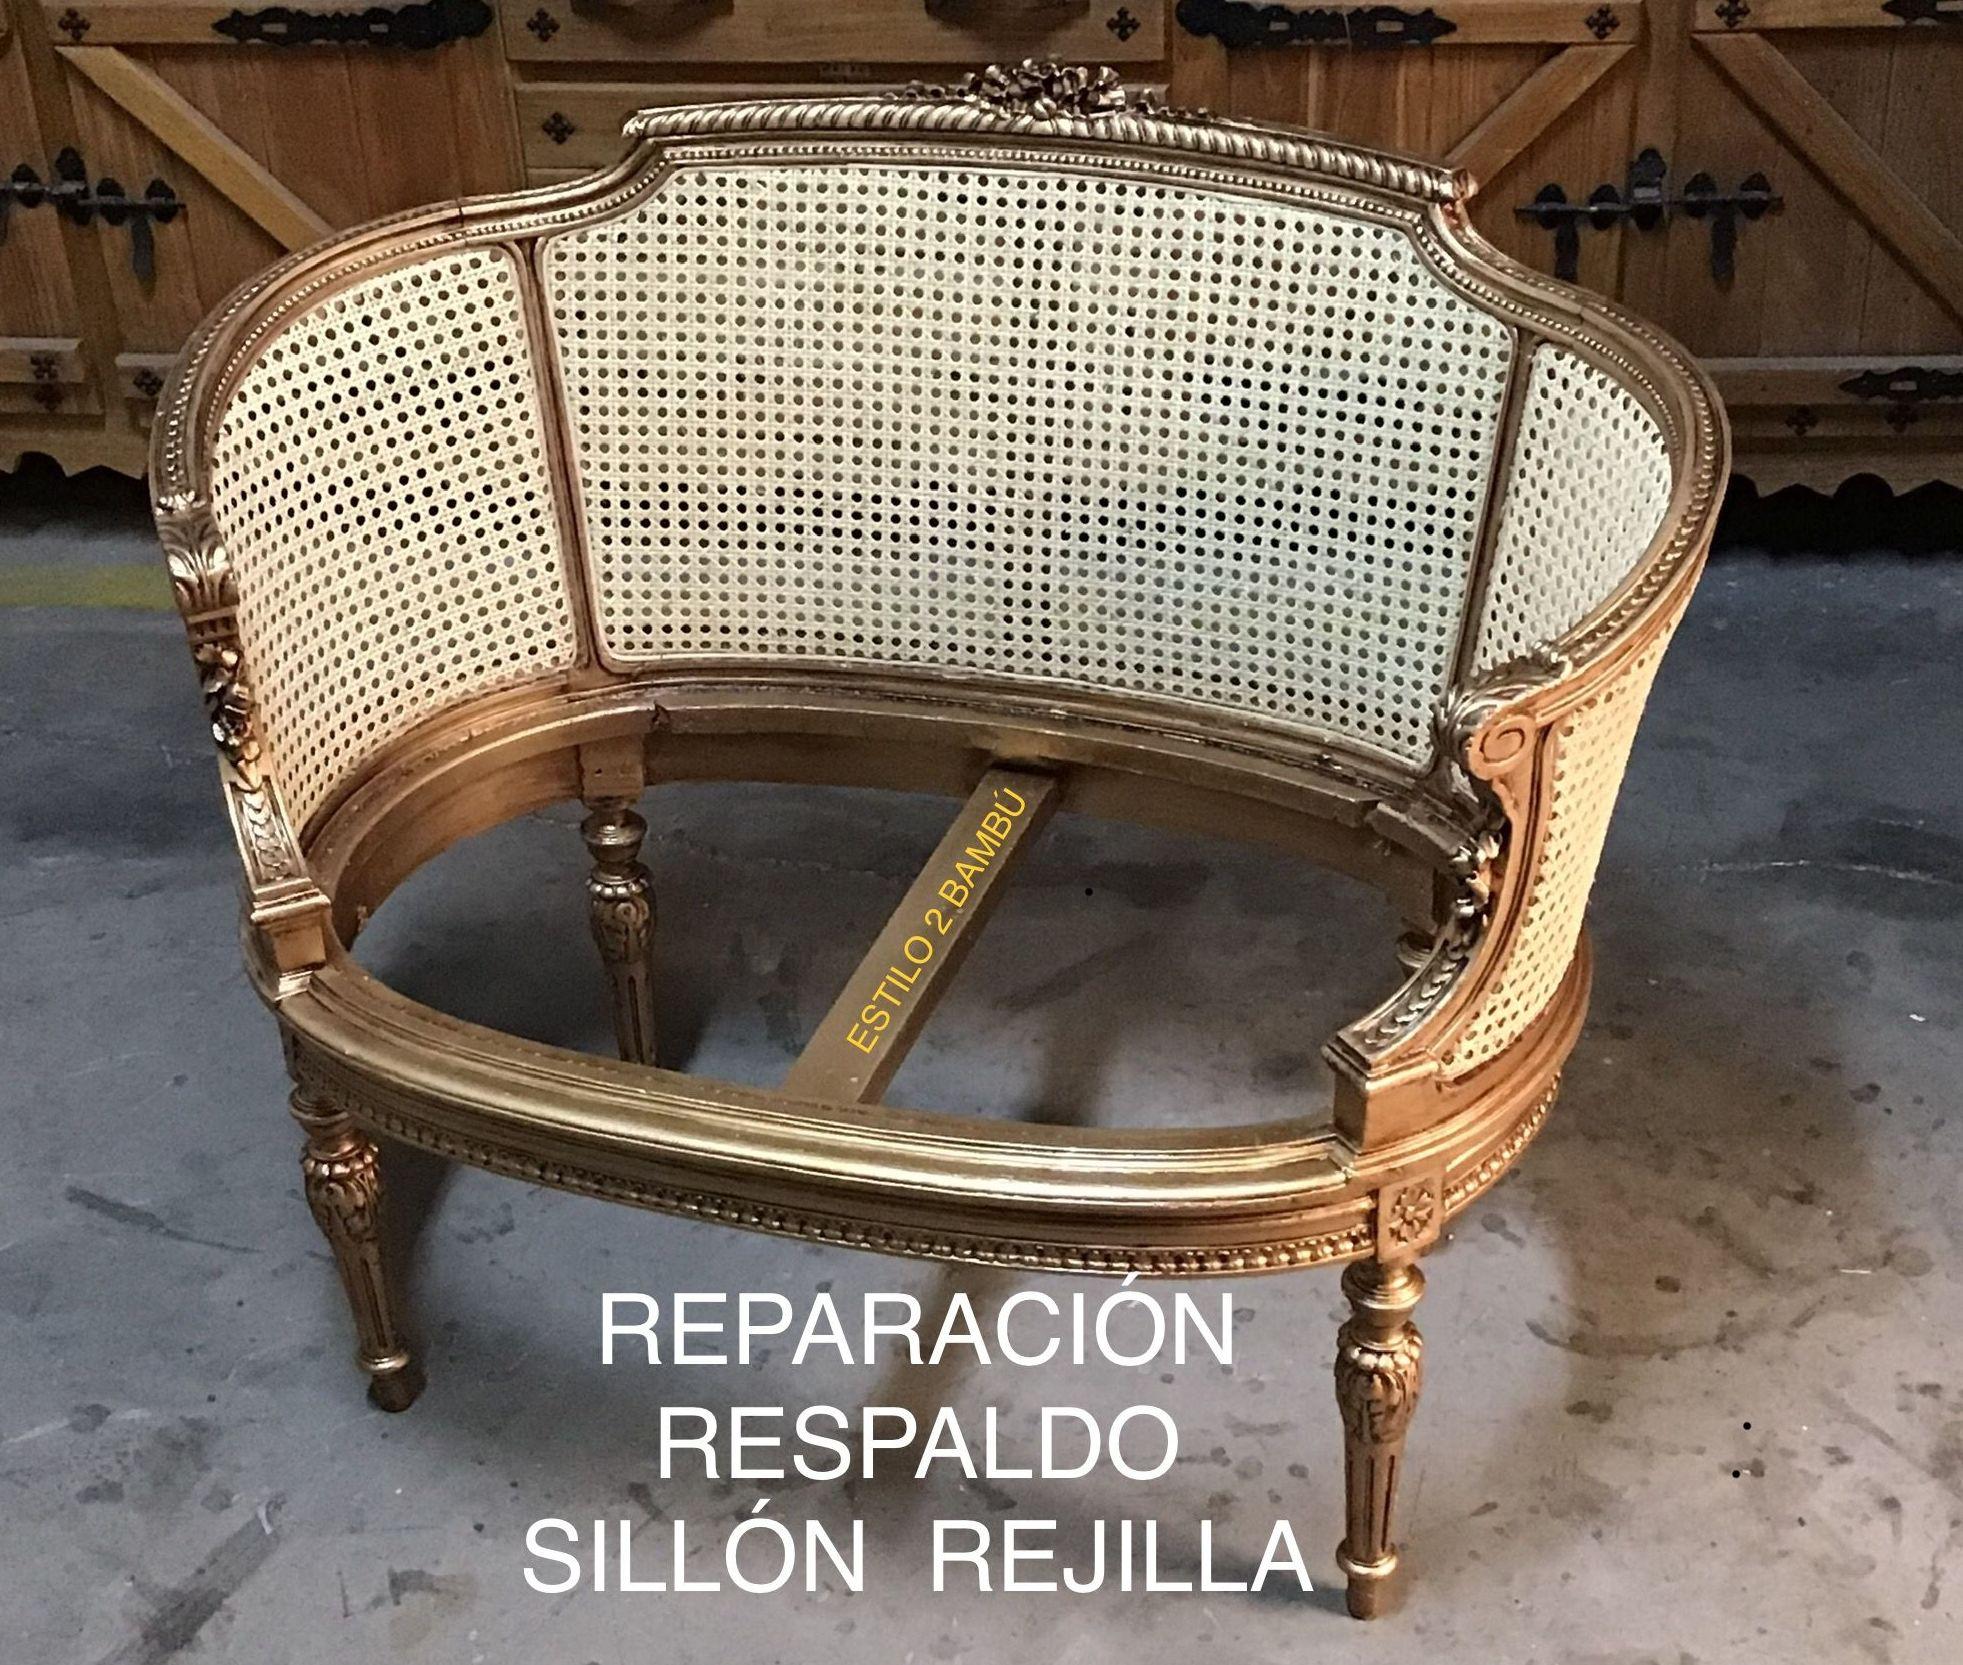 REPARACION RESPALDO SILLON REJILLA